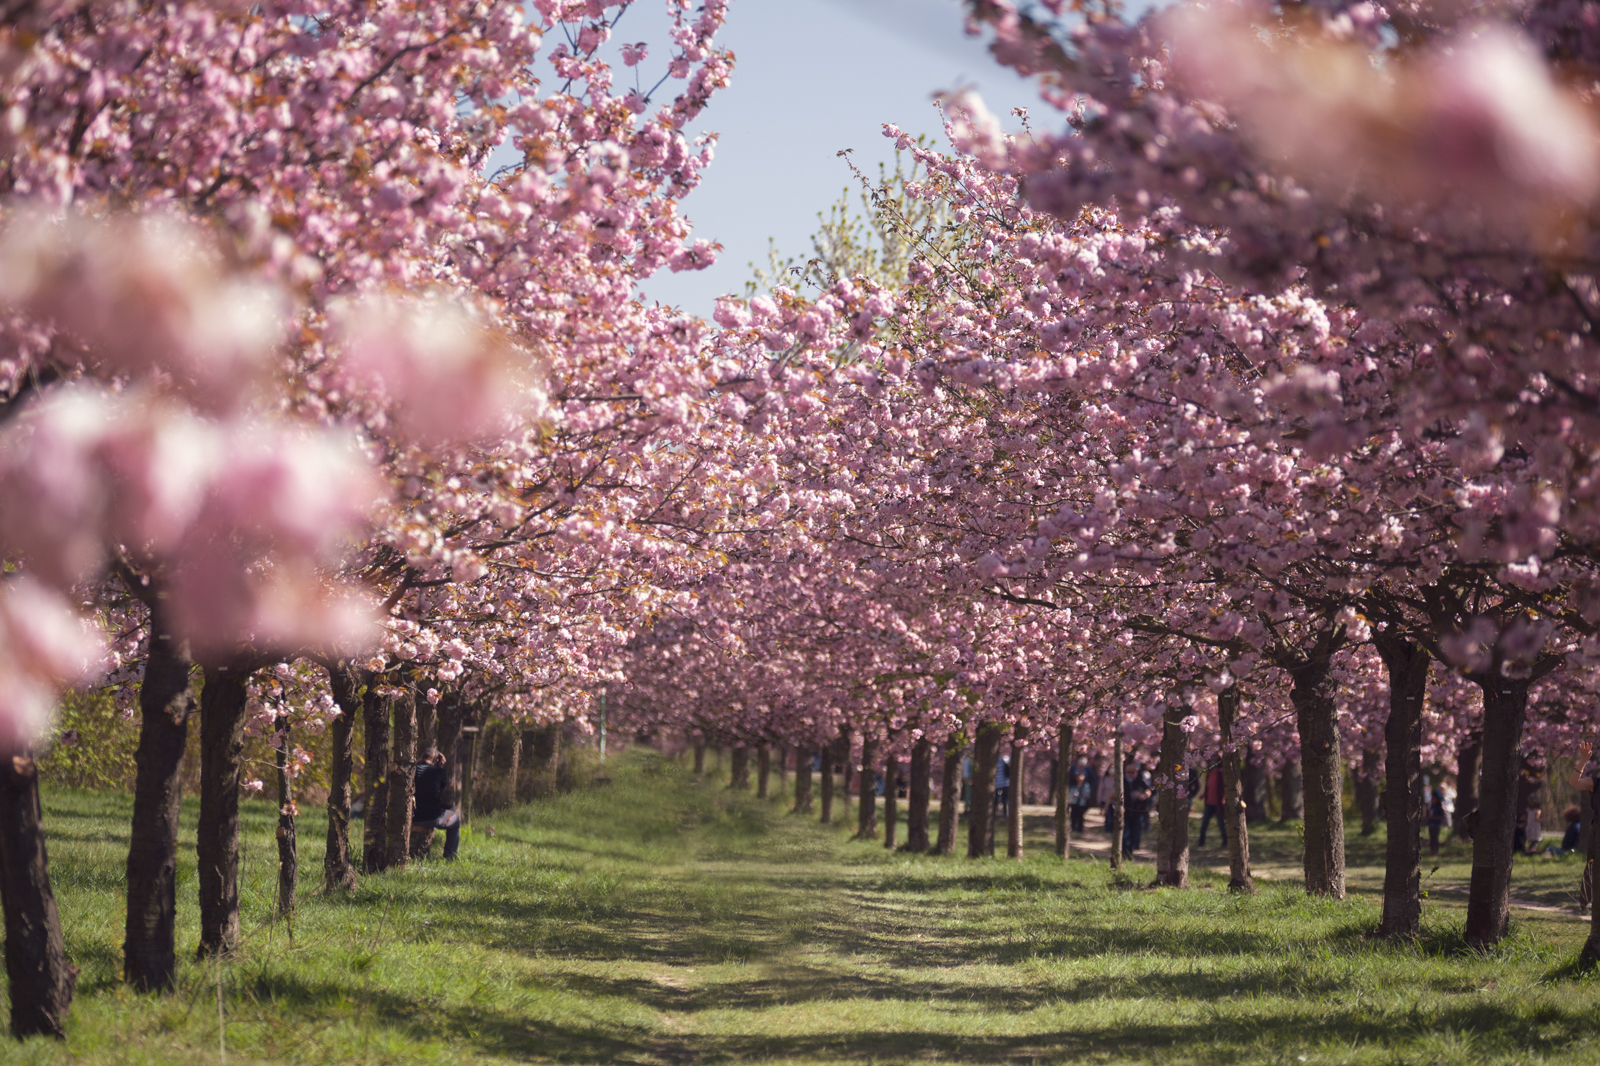 Jaworskyj Foto Reiseführer Top Fotospots im Frühling